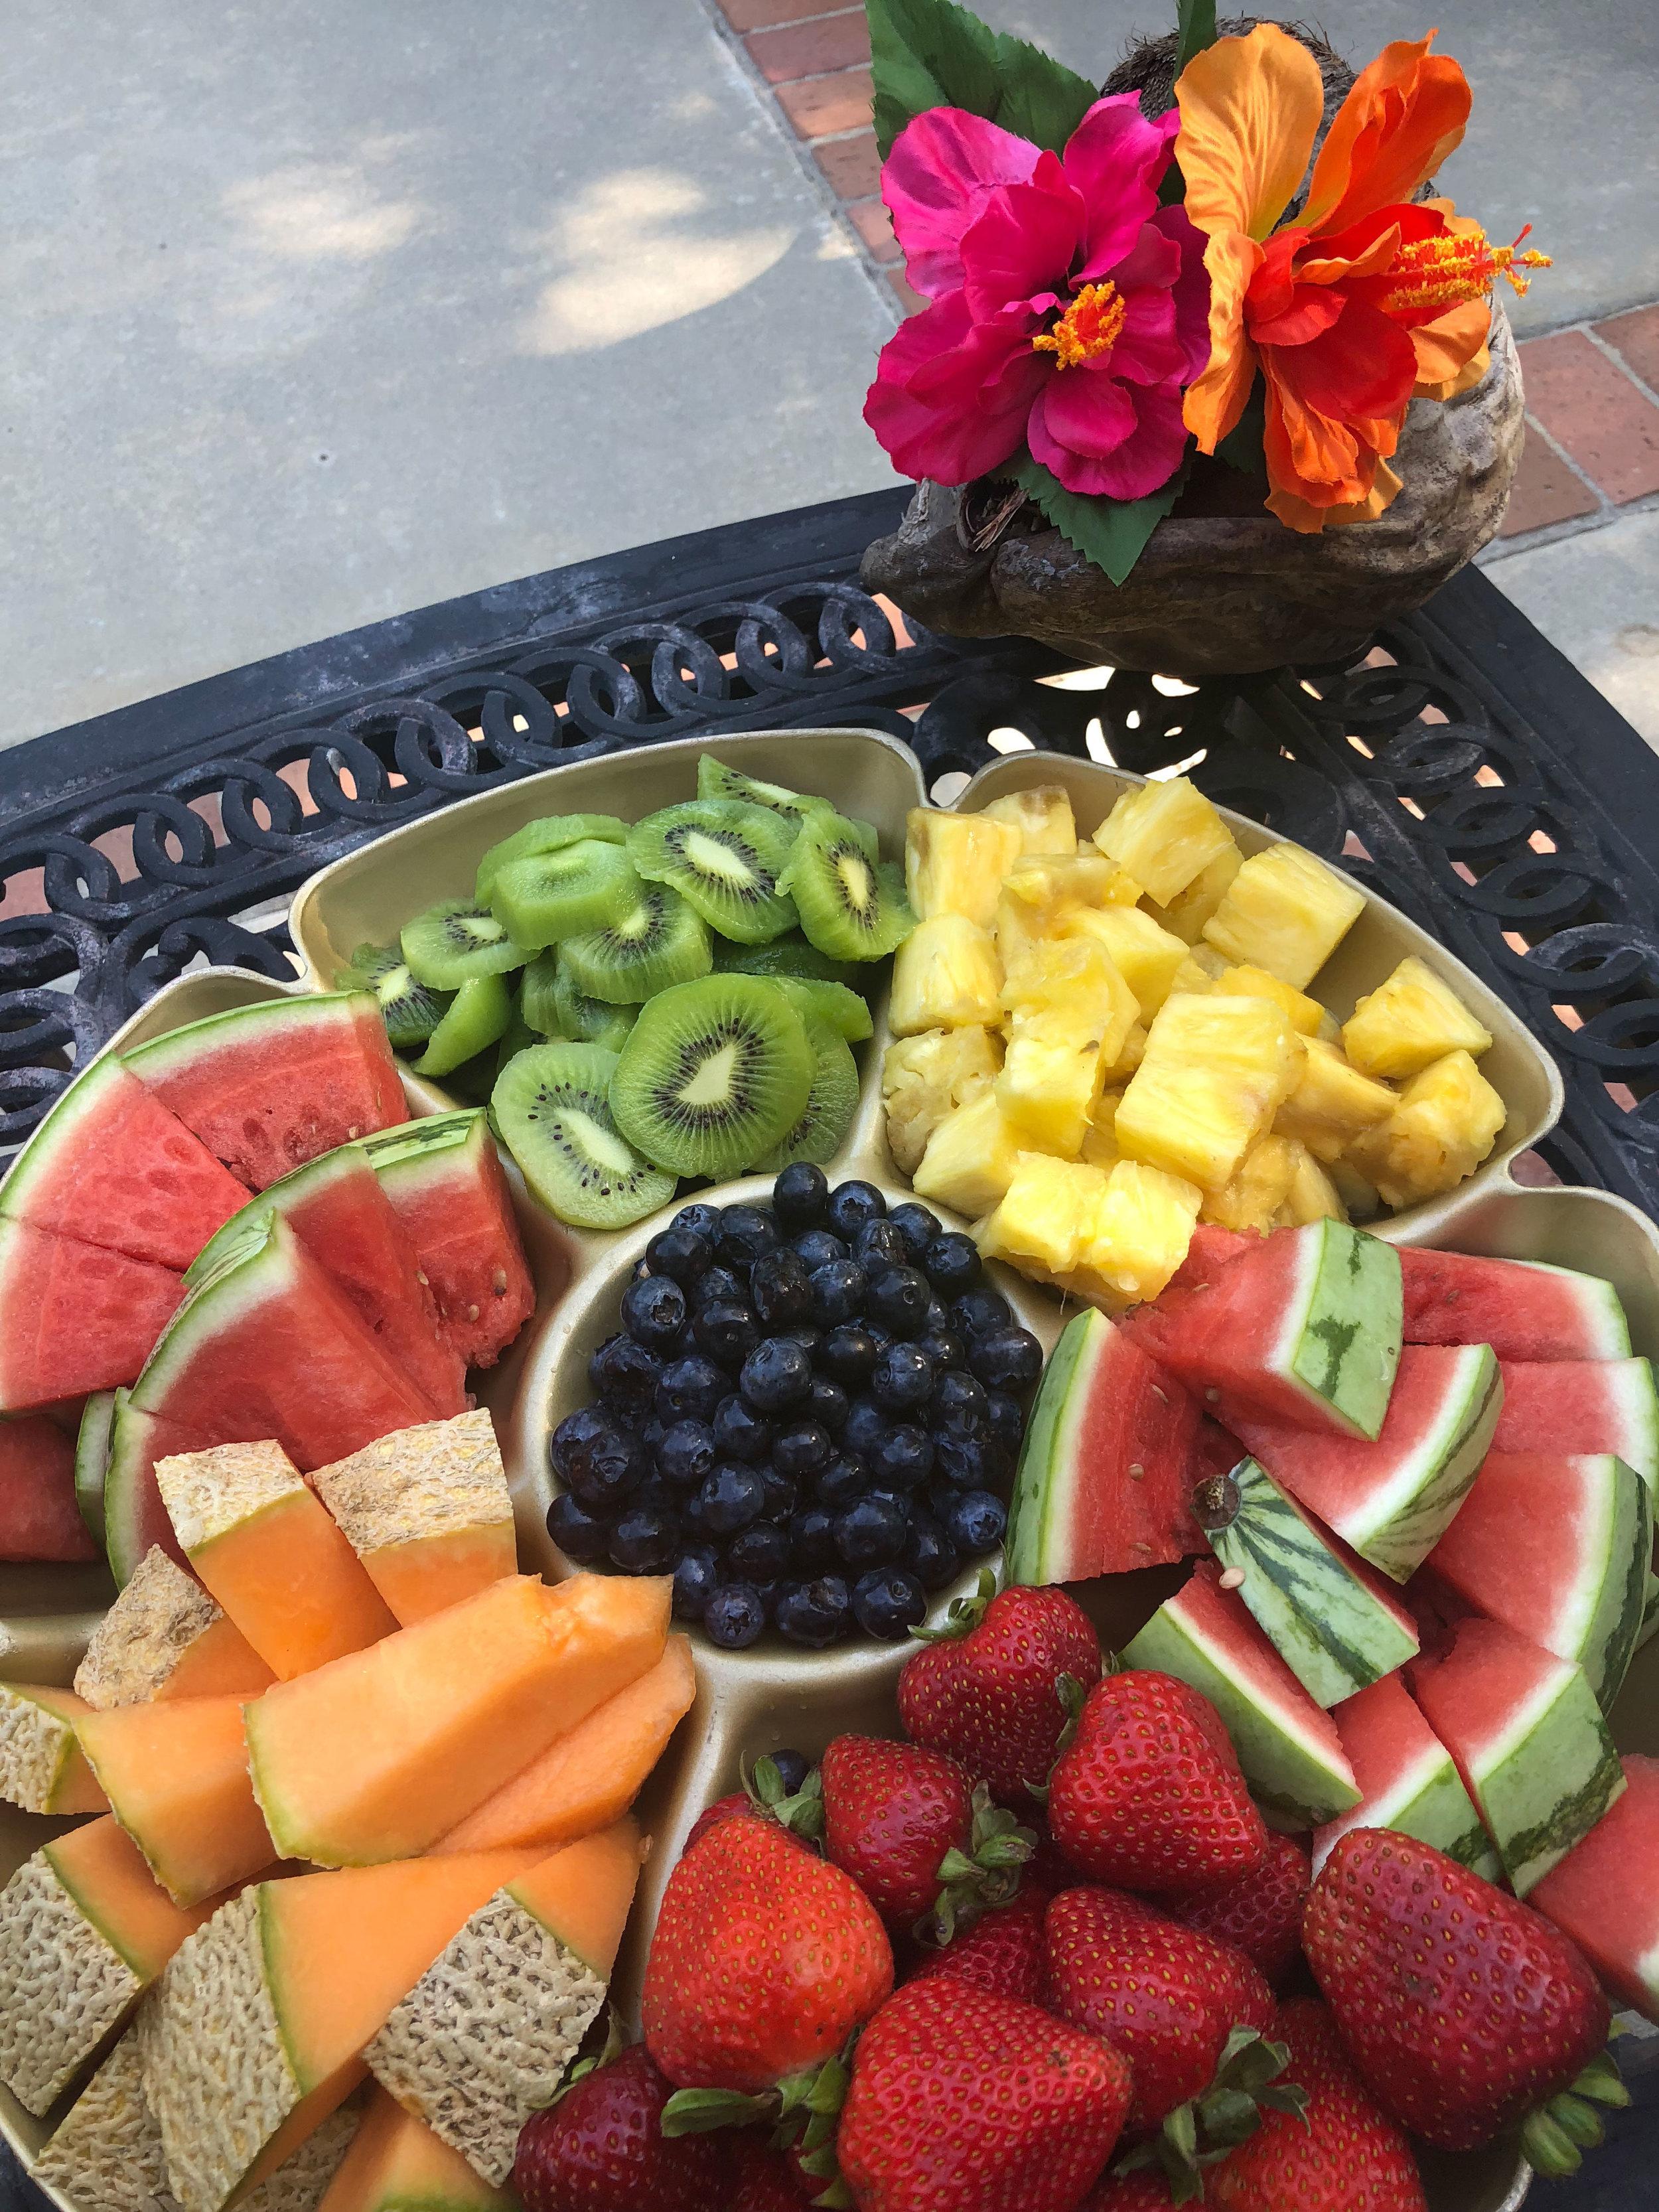 FruitPlate_Image.jpg